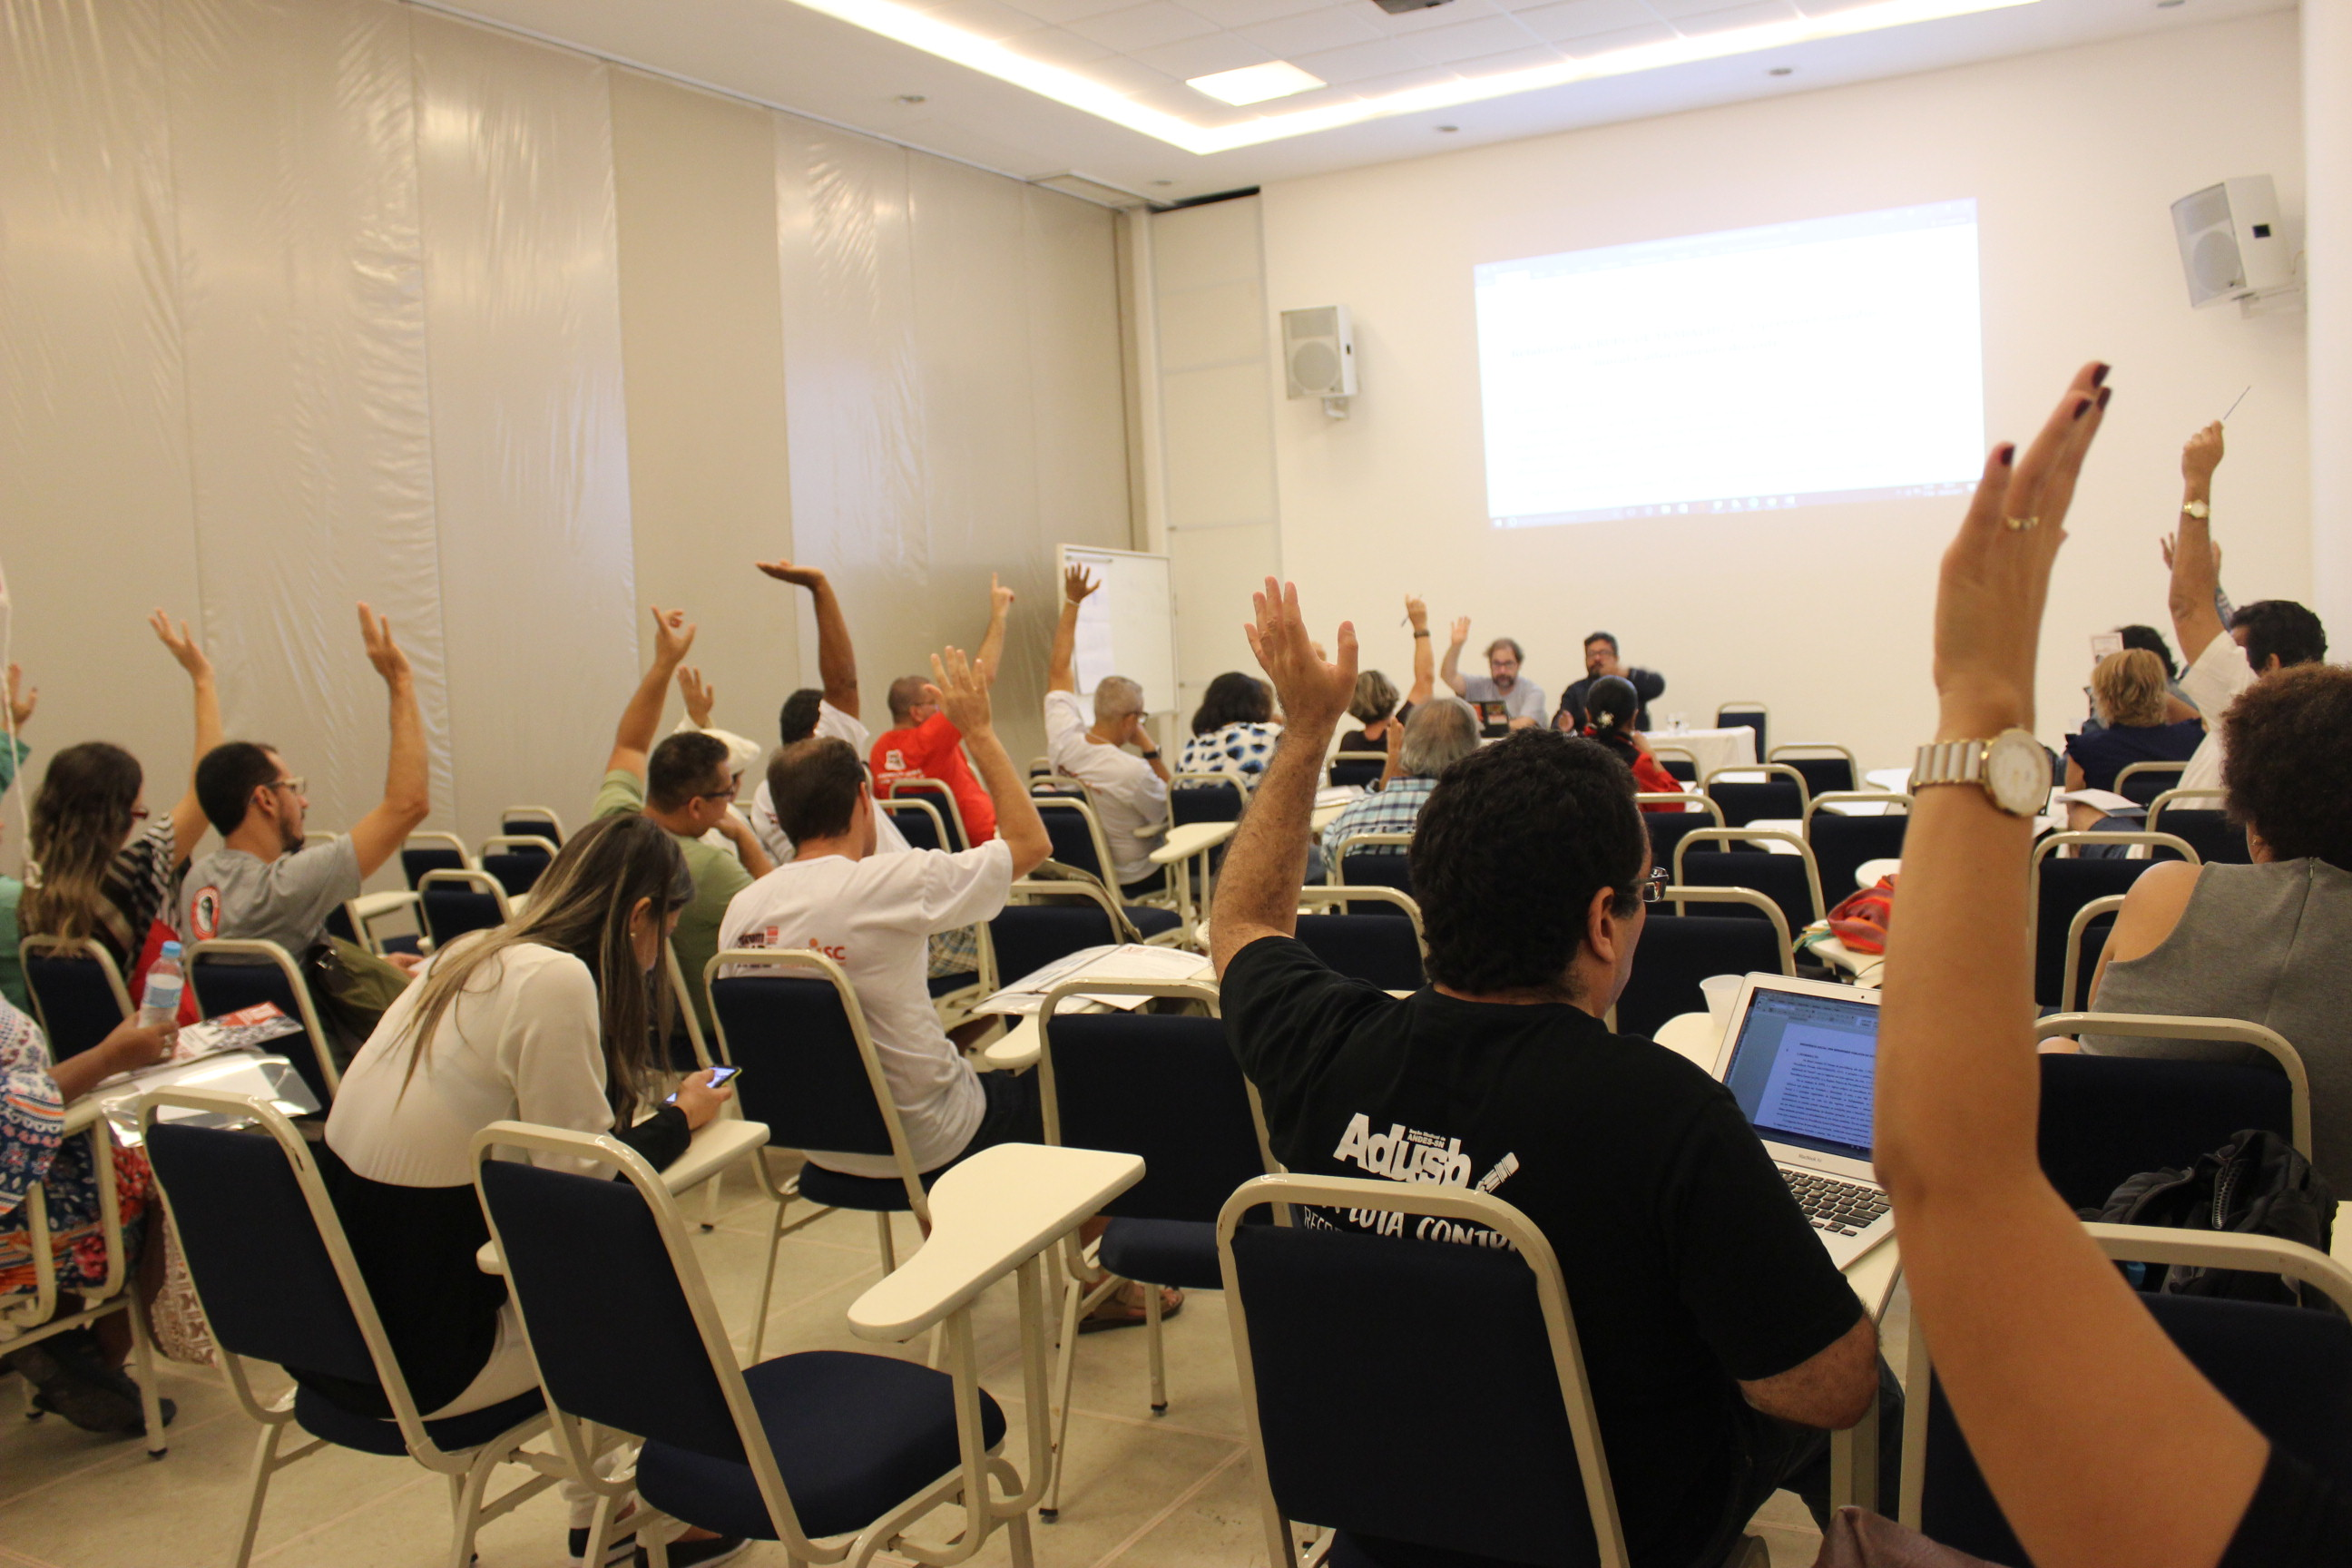 XIII Encontro dos Docentes das Universidades Estaduais baianas se encerra de forma vitoriosa